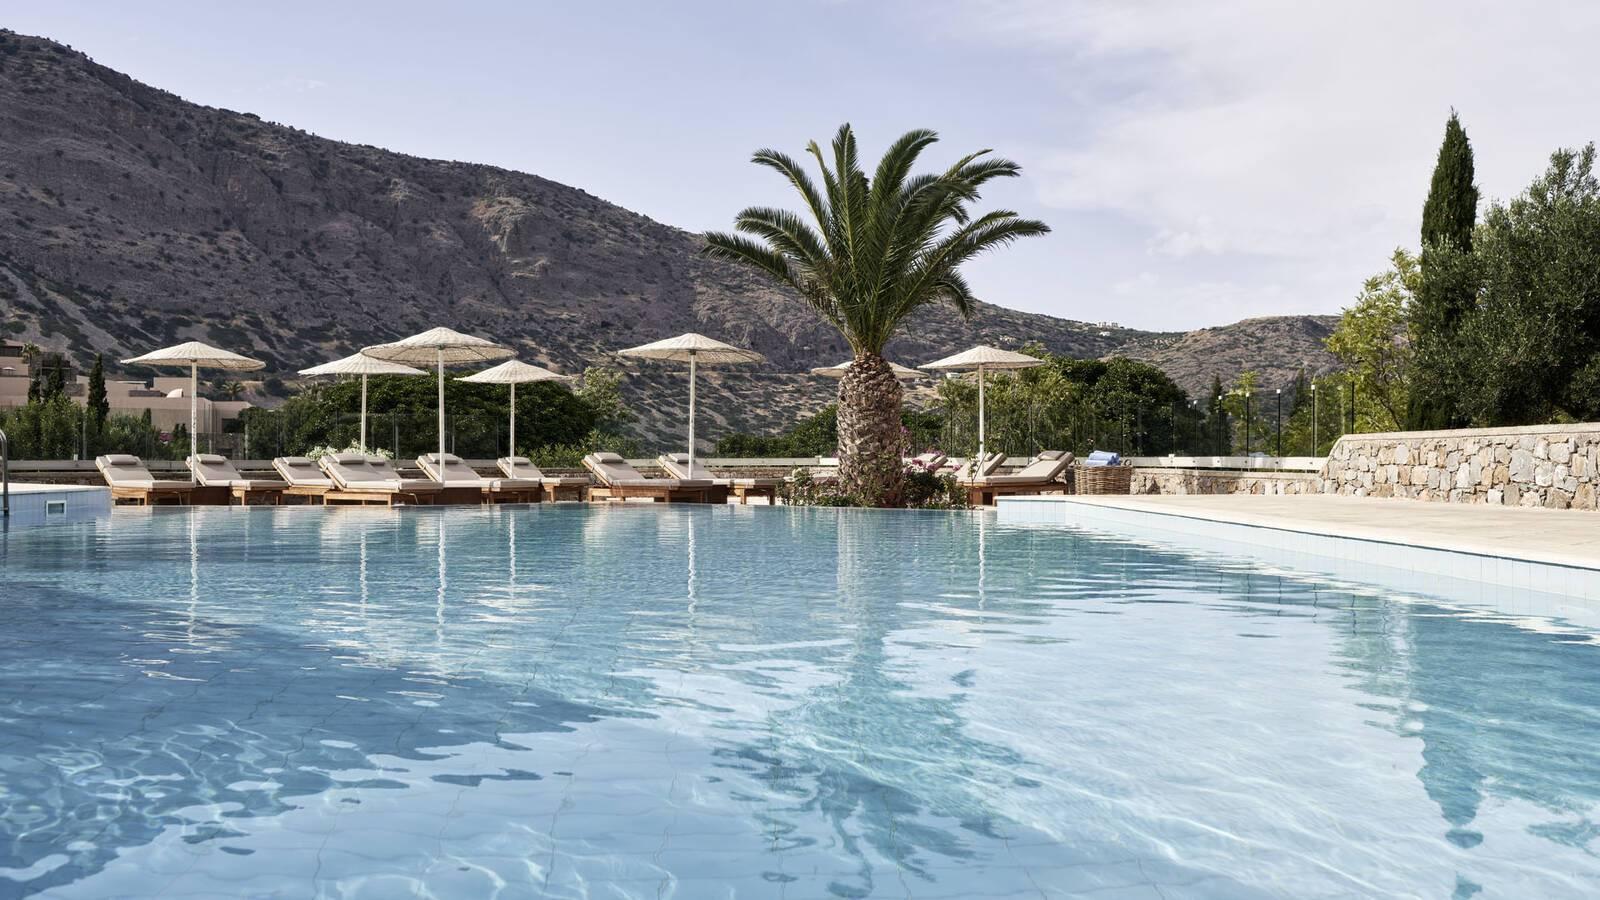 Blue Palace Crete Piscine